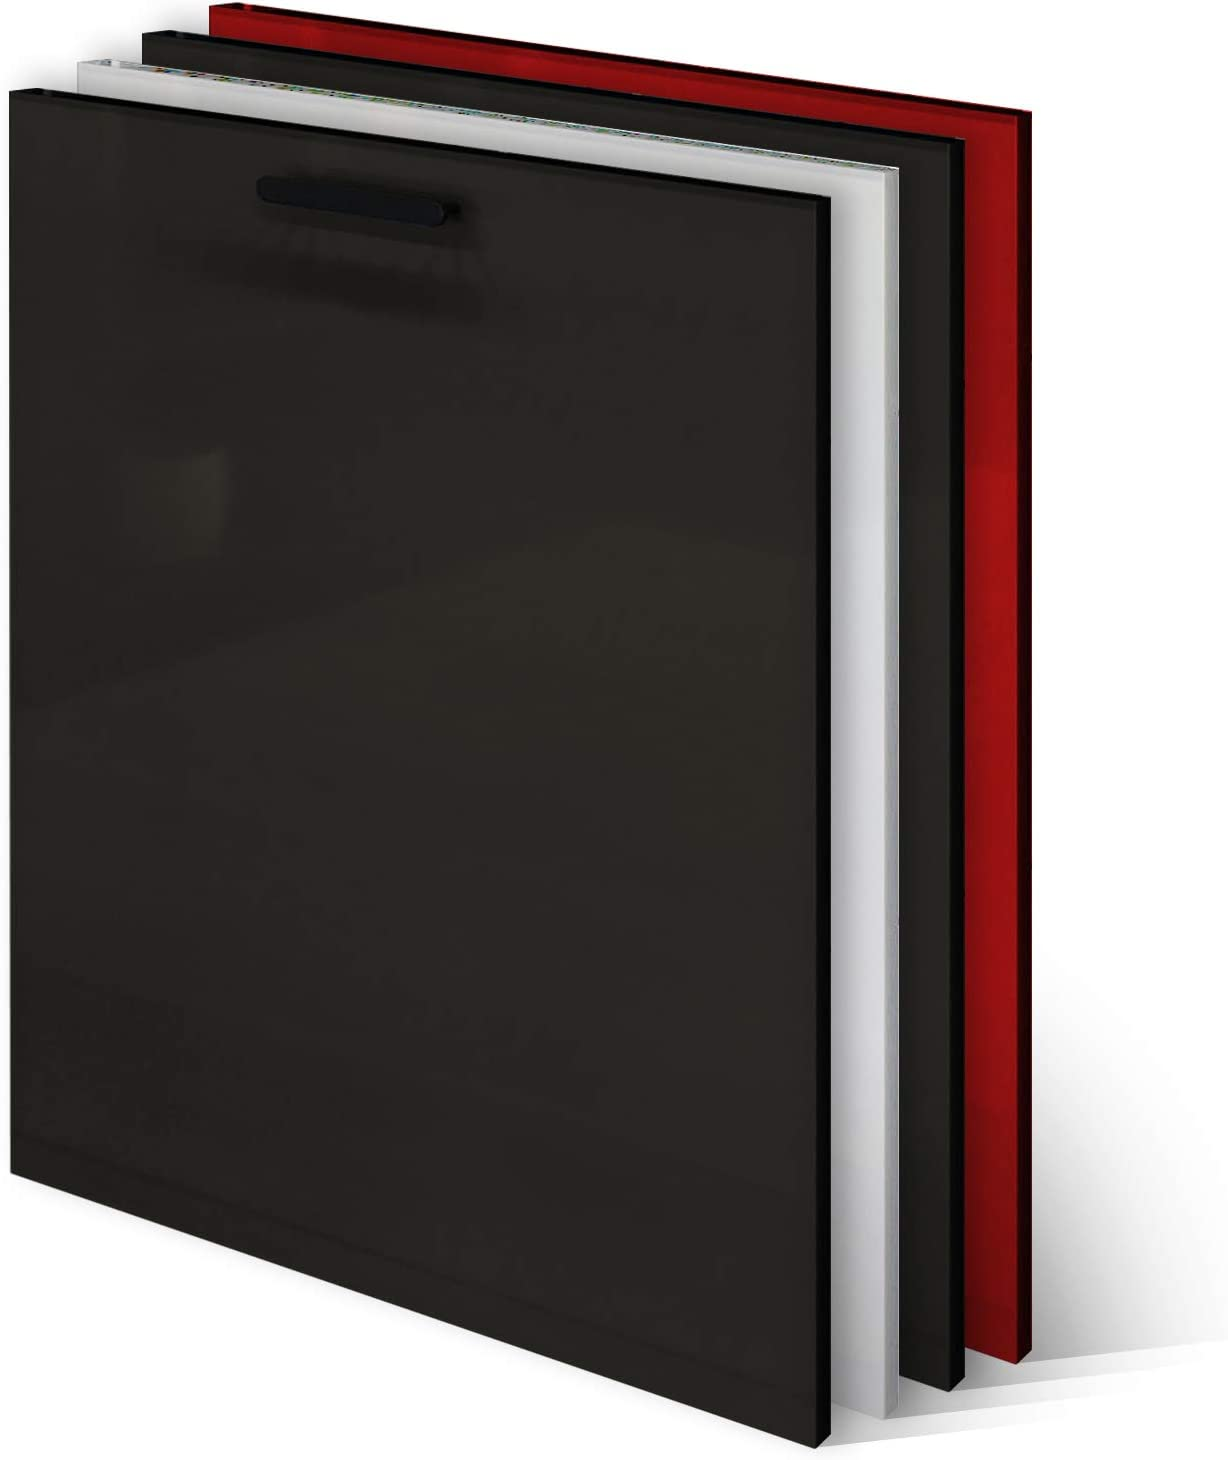 KLEMP Panel frontal para lavavajillas, 594 x 565 mm, negro, panel para lavavajillas totalmente integrado